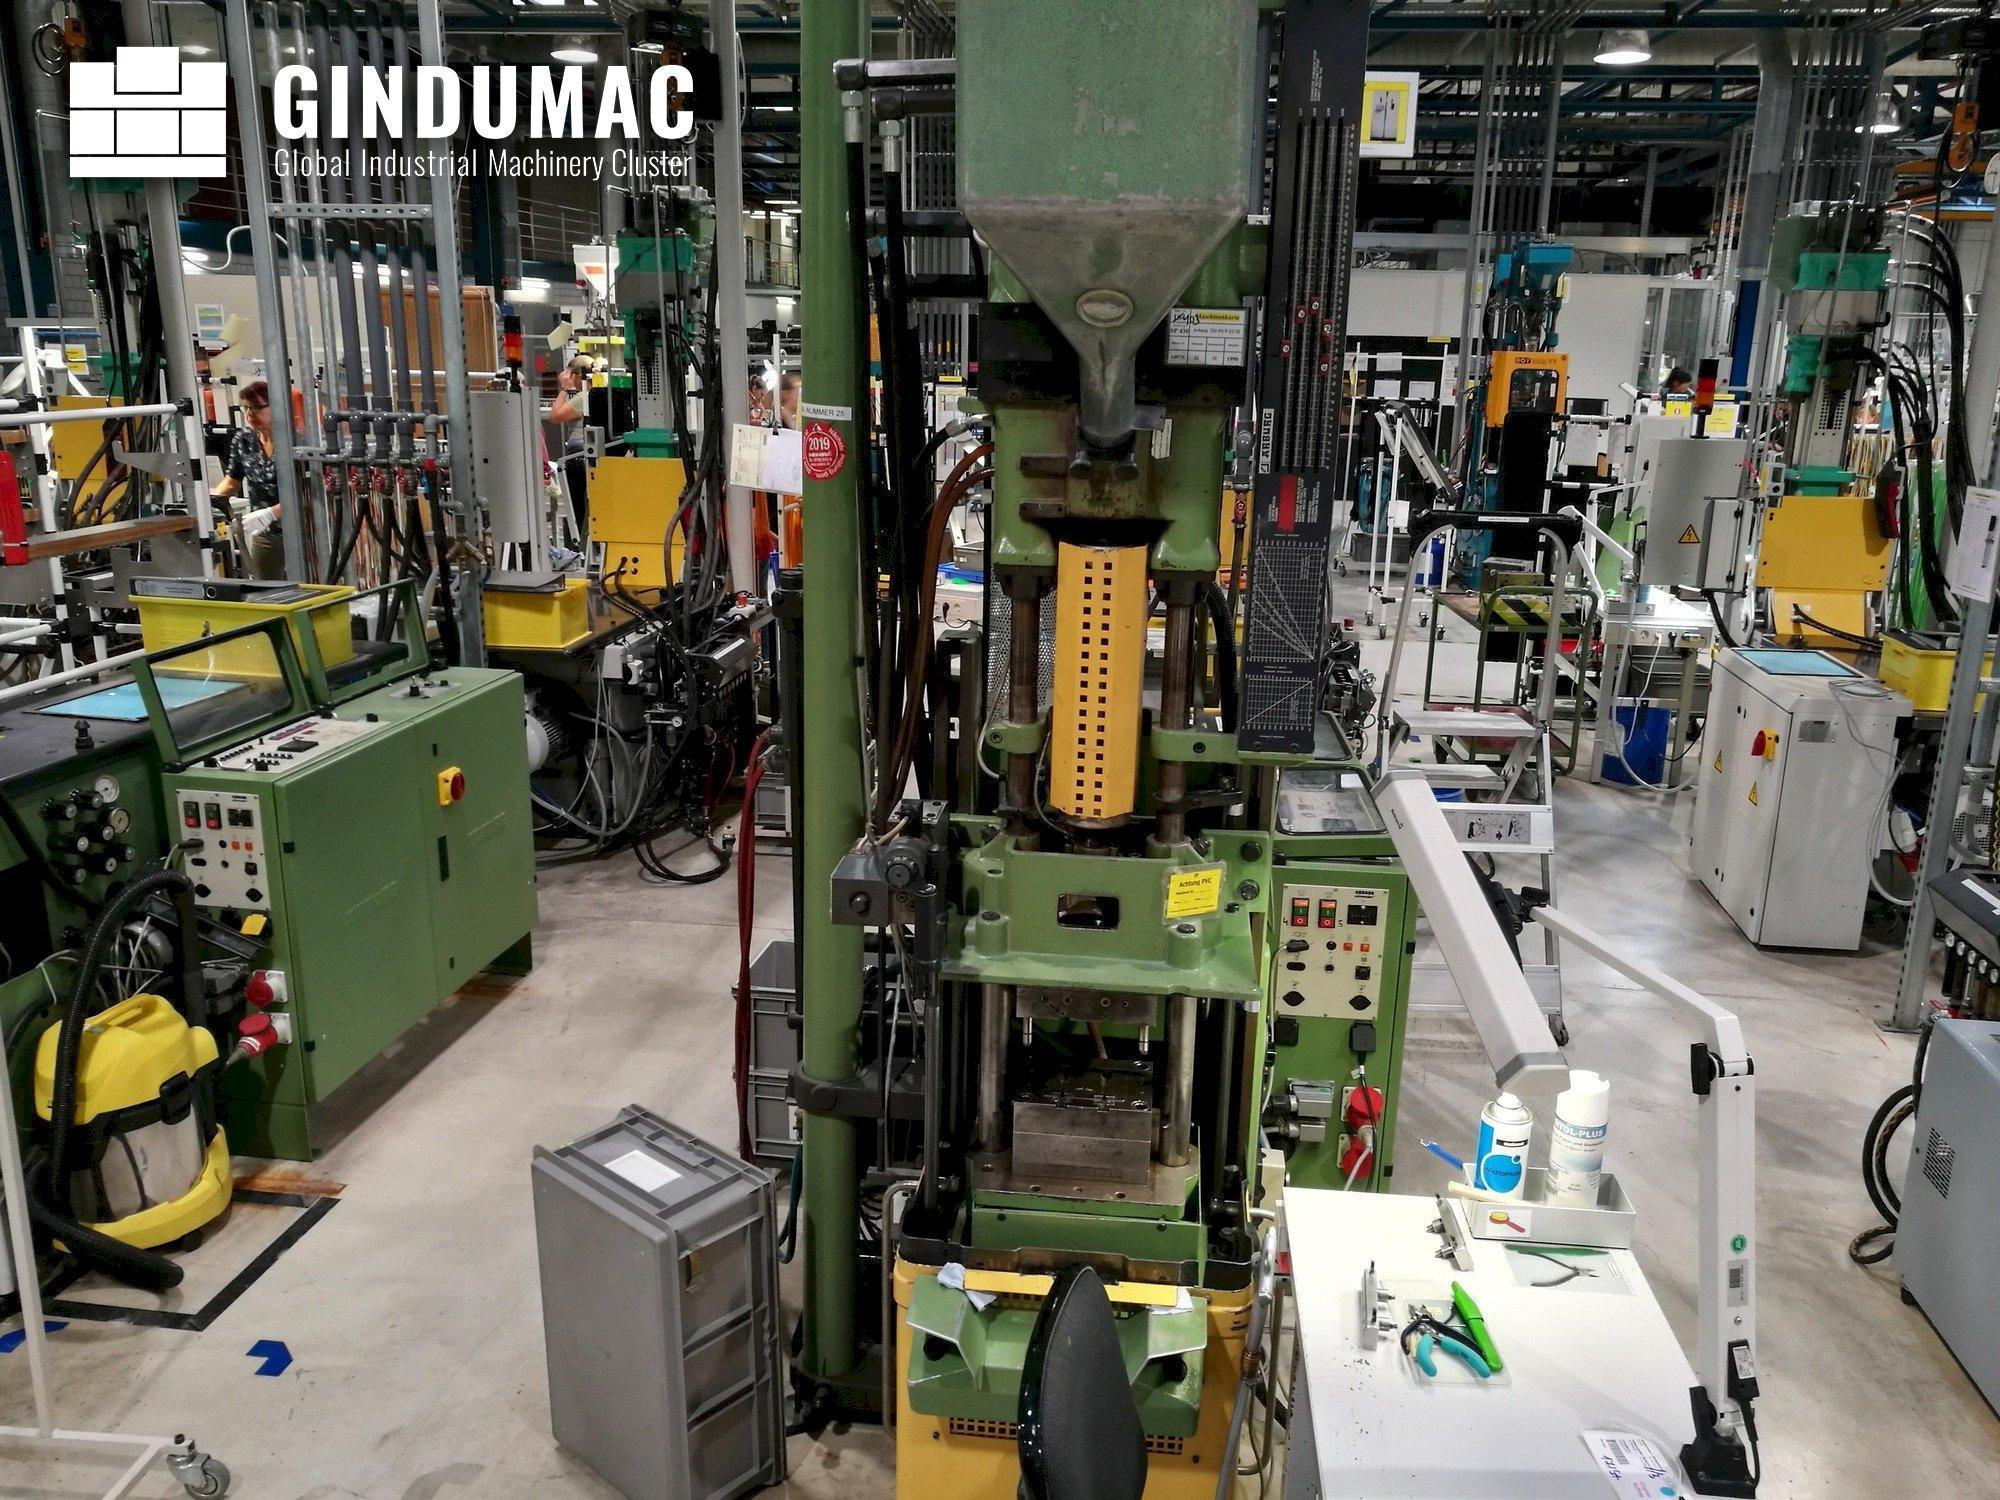 injection moulding machines - Arburg 221-75-350